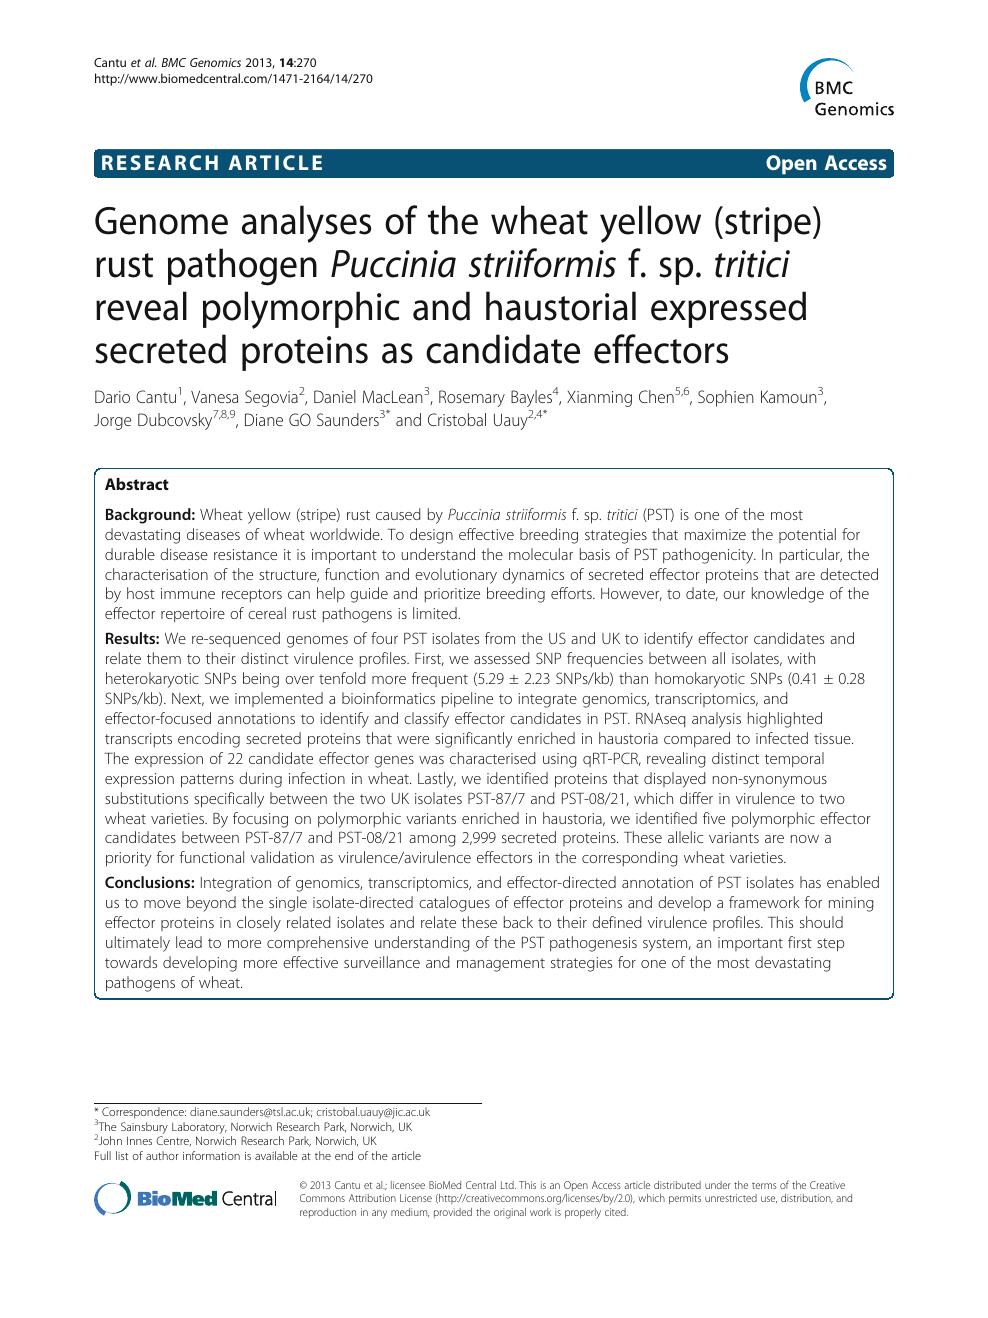 Genome analyses of the wheat yellow (stripe) rust pathogen